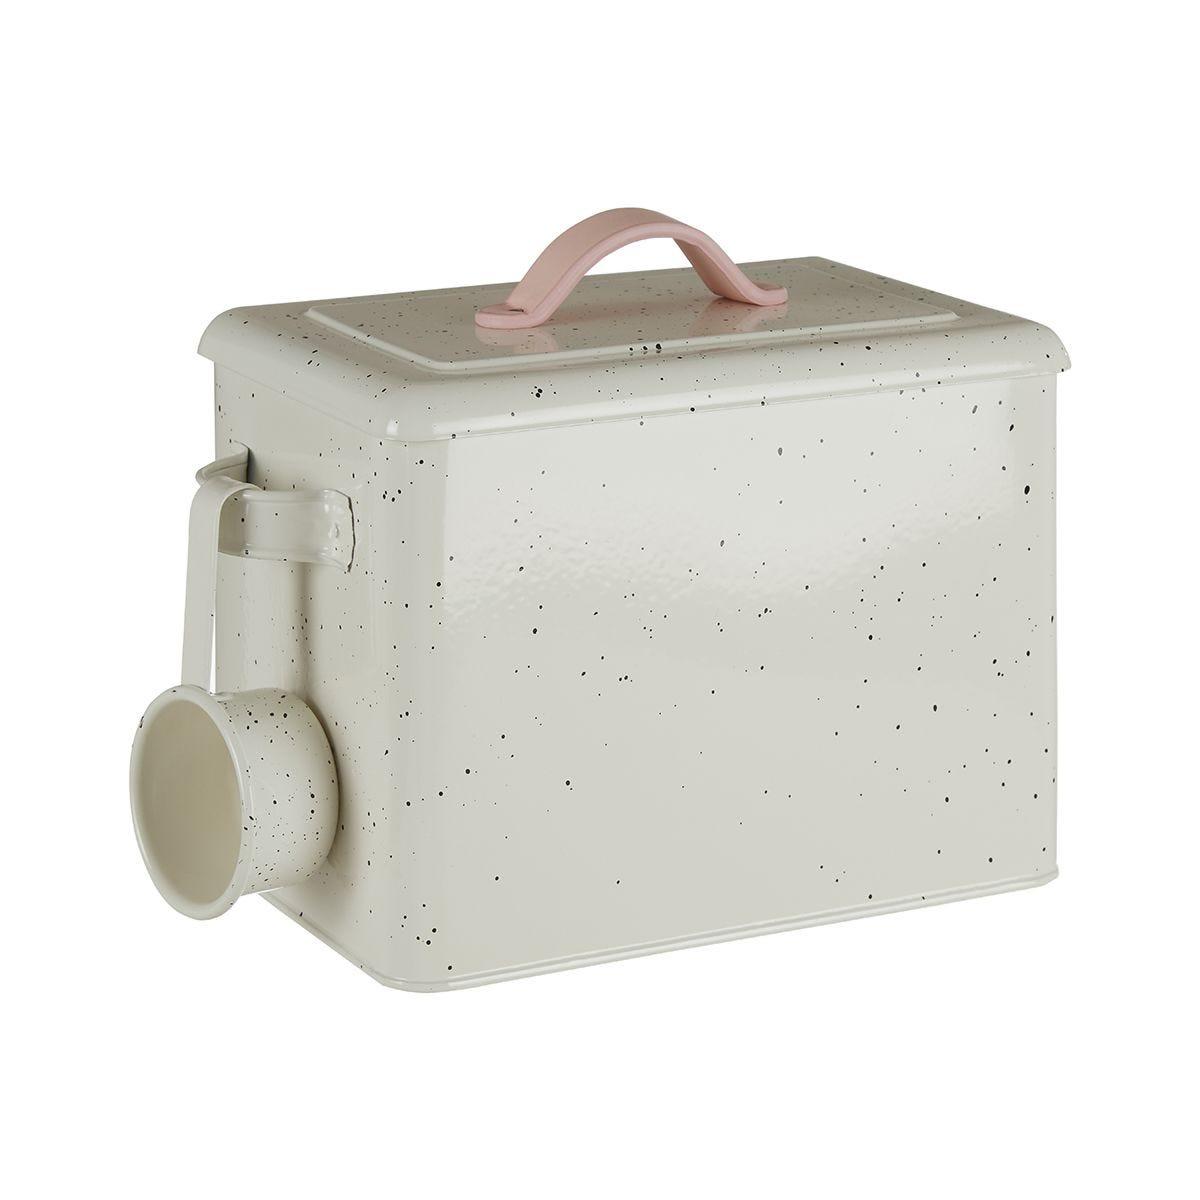 Premier Housewares Sweet Heart Detergent Box And Scoop